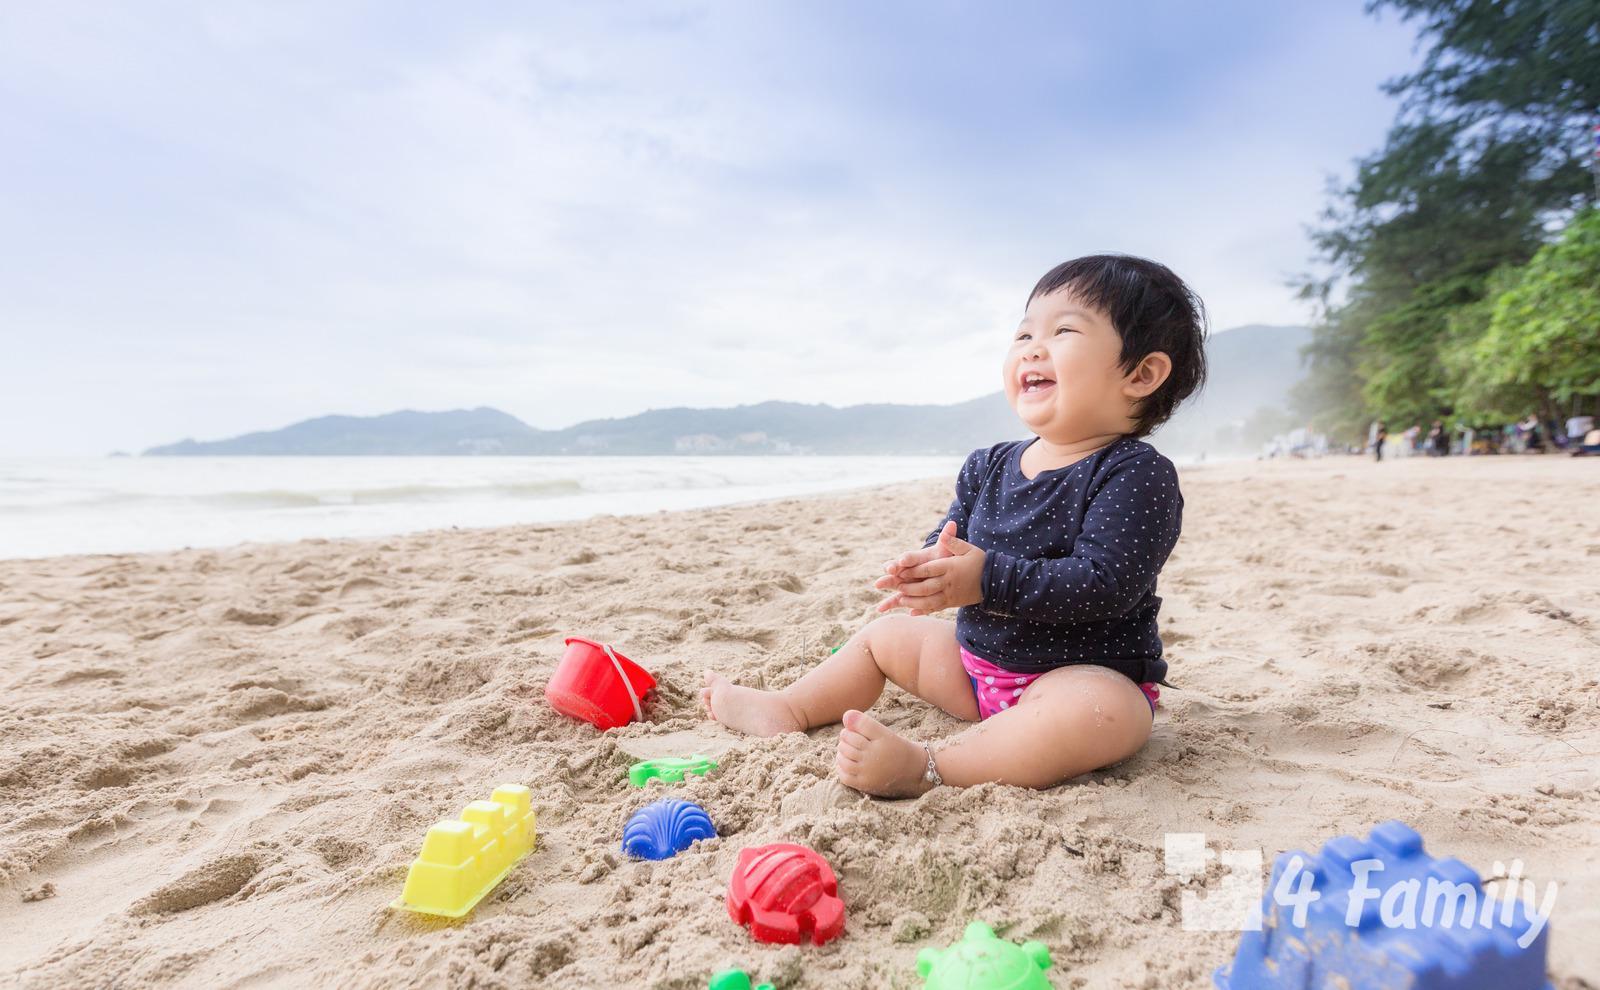 Фото. Идем на пляж с ребенком